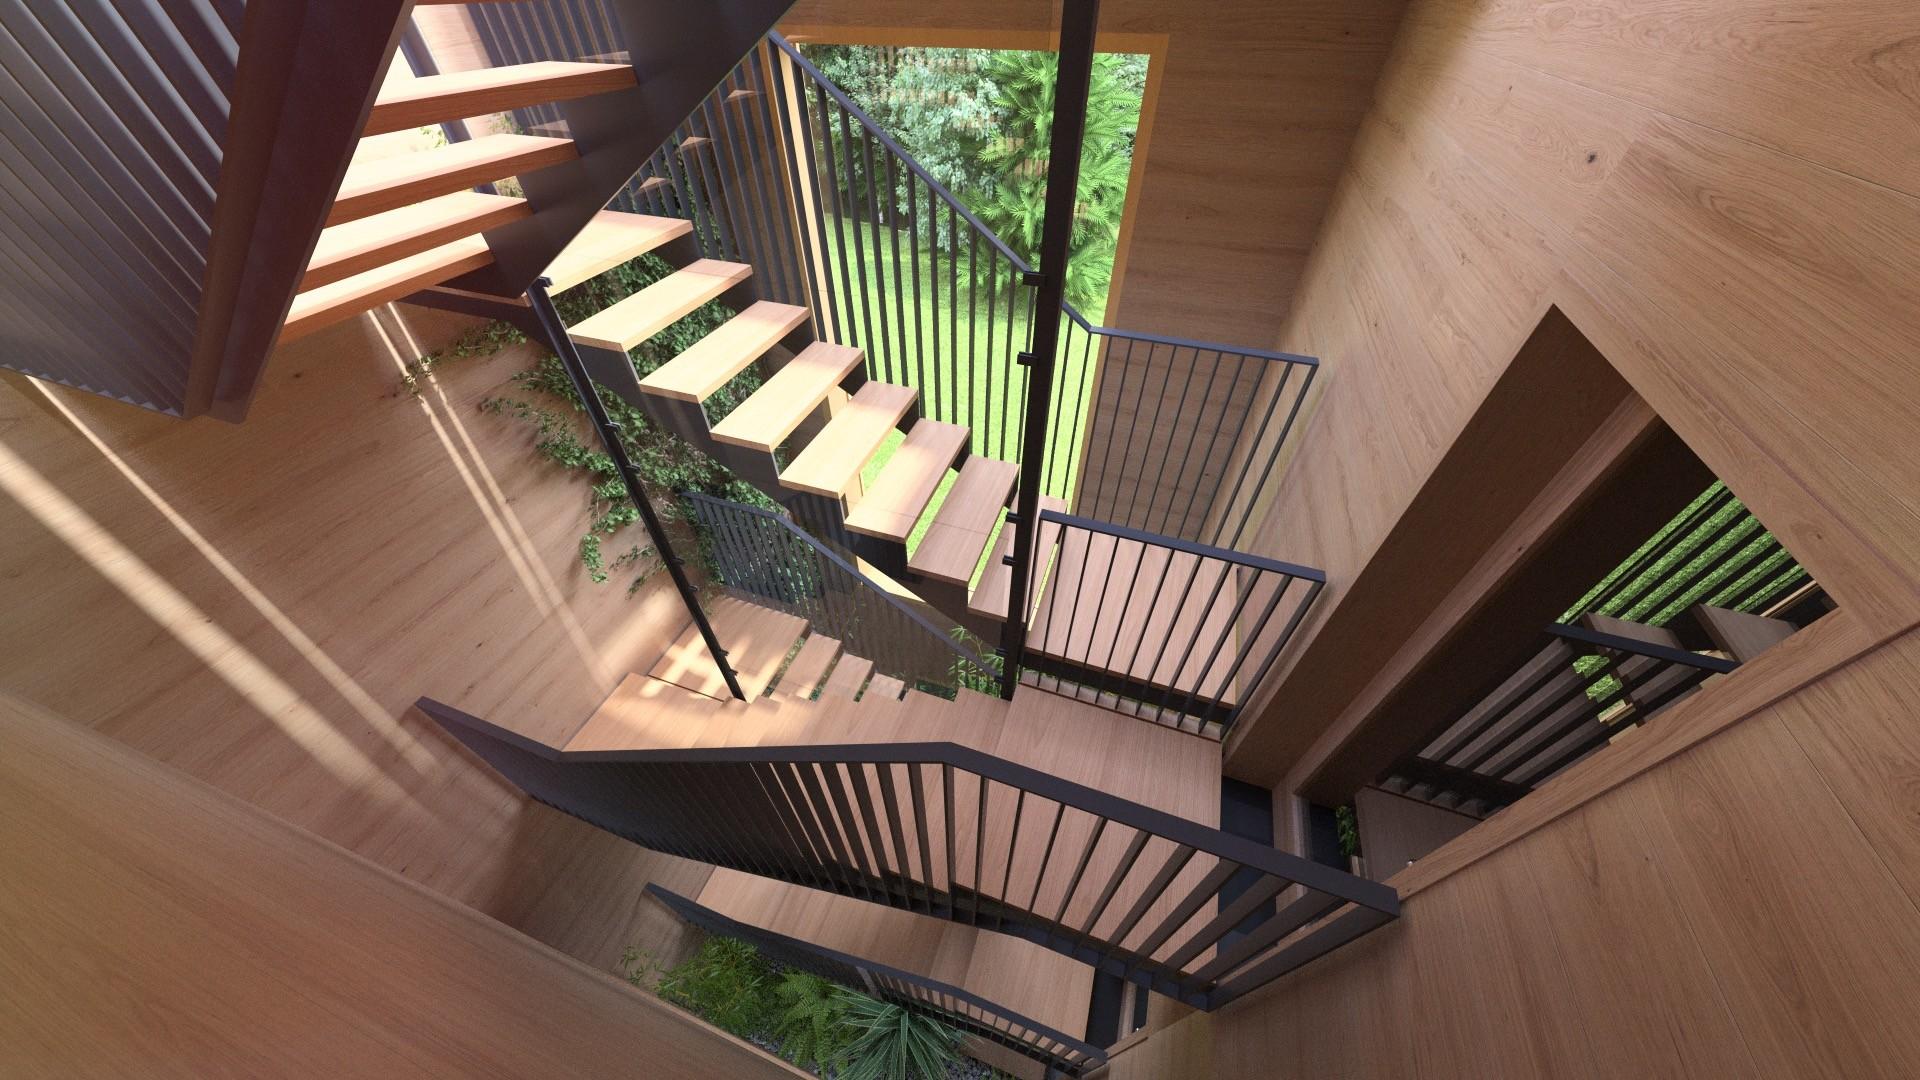 Duane kemp 28a a1309 villas portier 3d staircase garage staircase 2nd floor 01g post